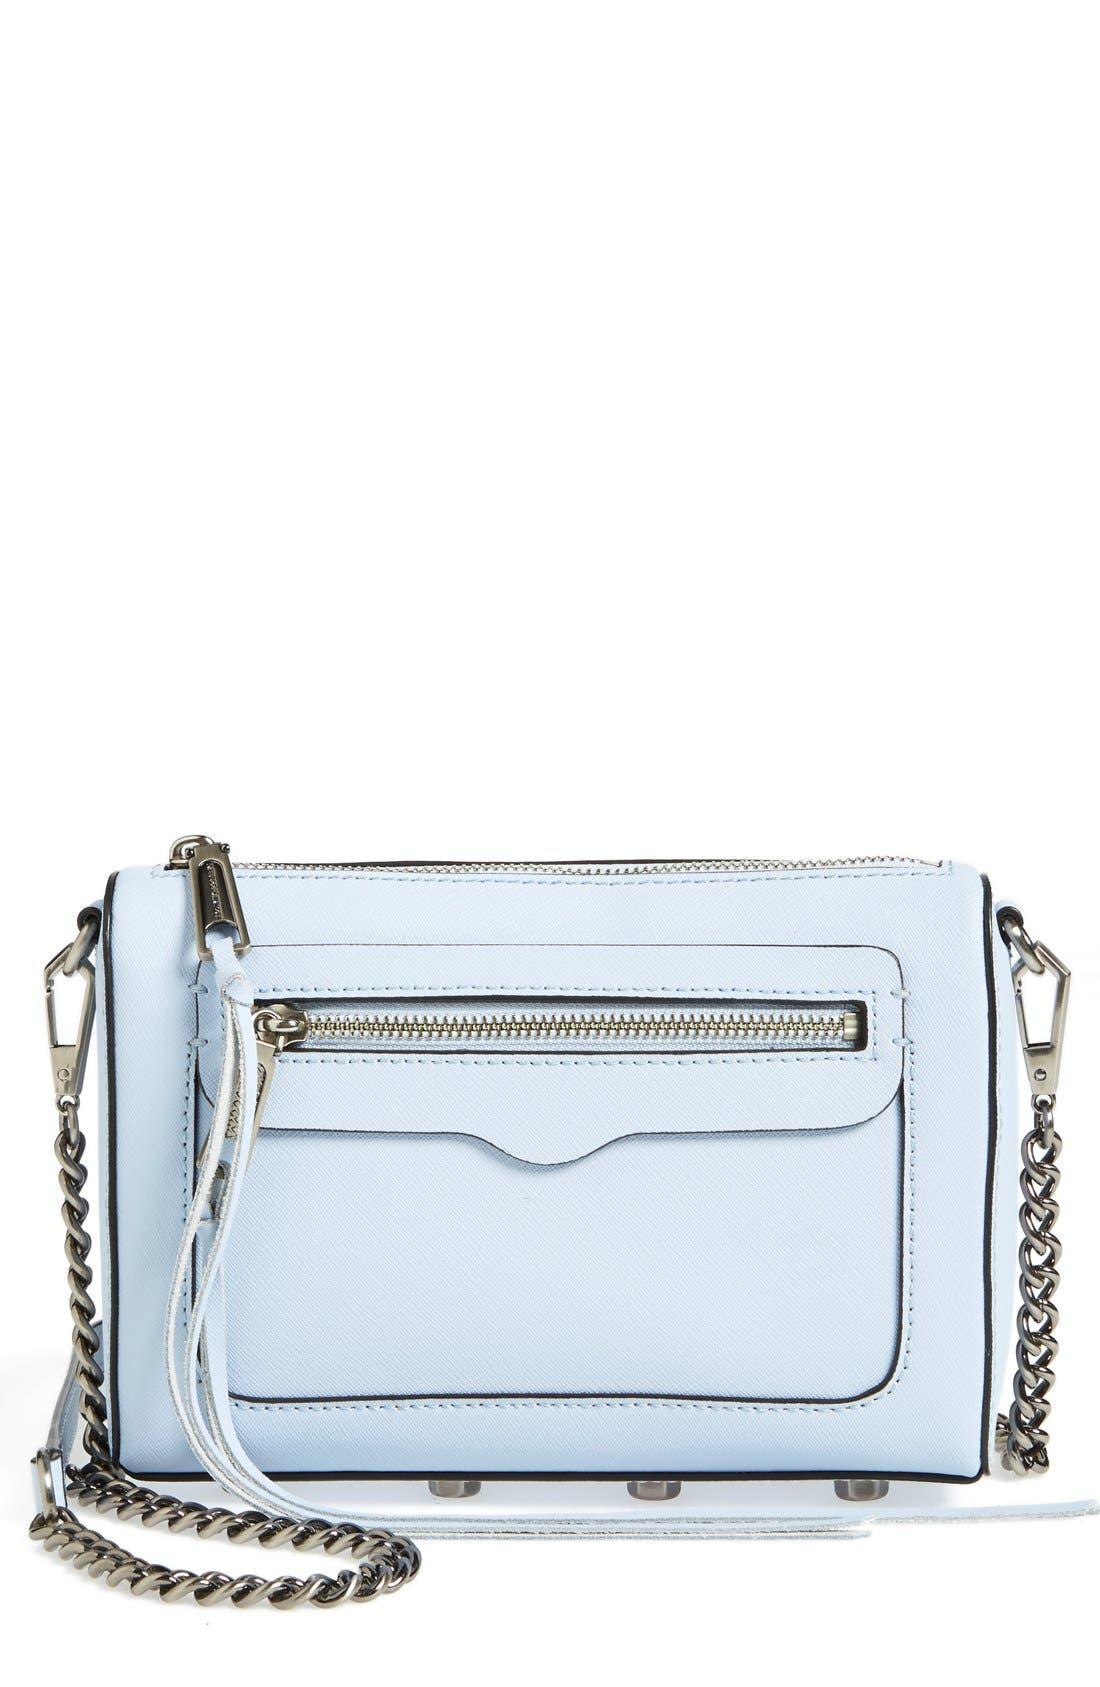 REBECCA MINKOFF 'Avery' Crossbody Bag, Main, color, 400